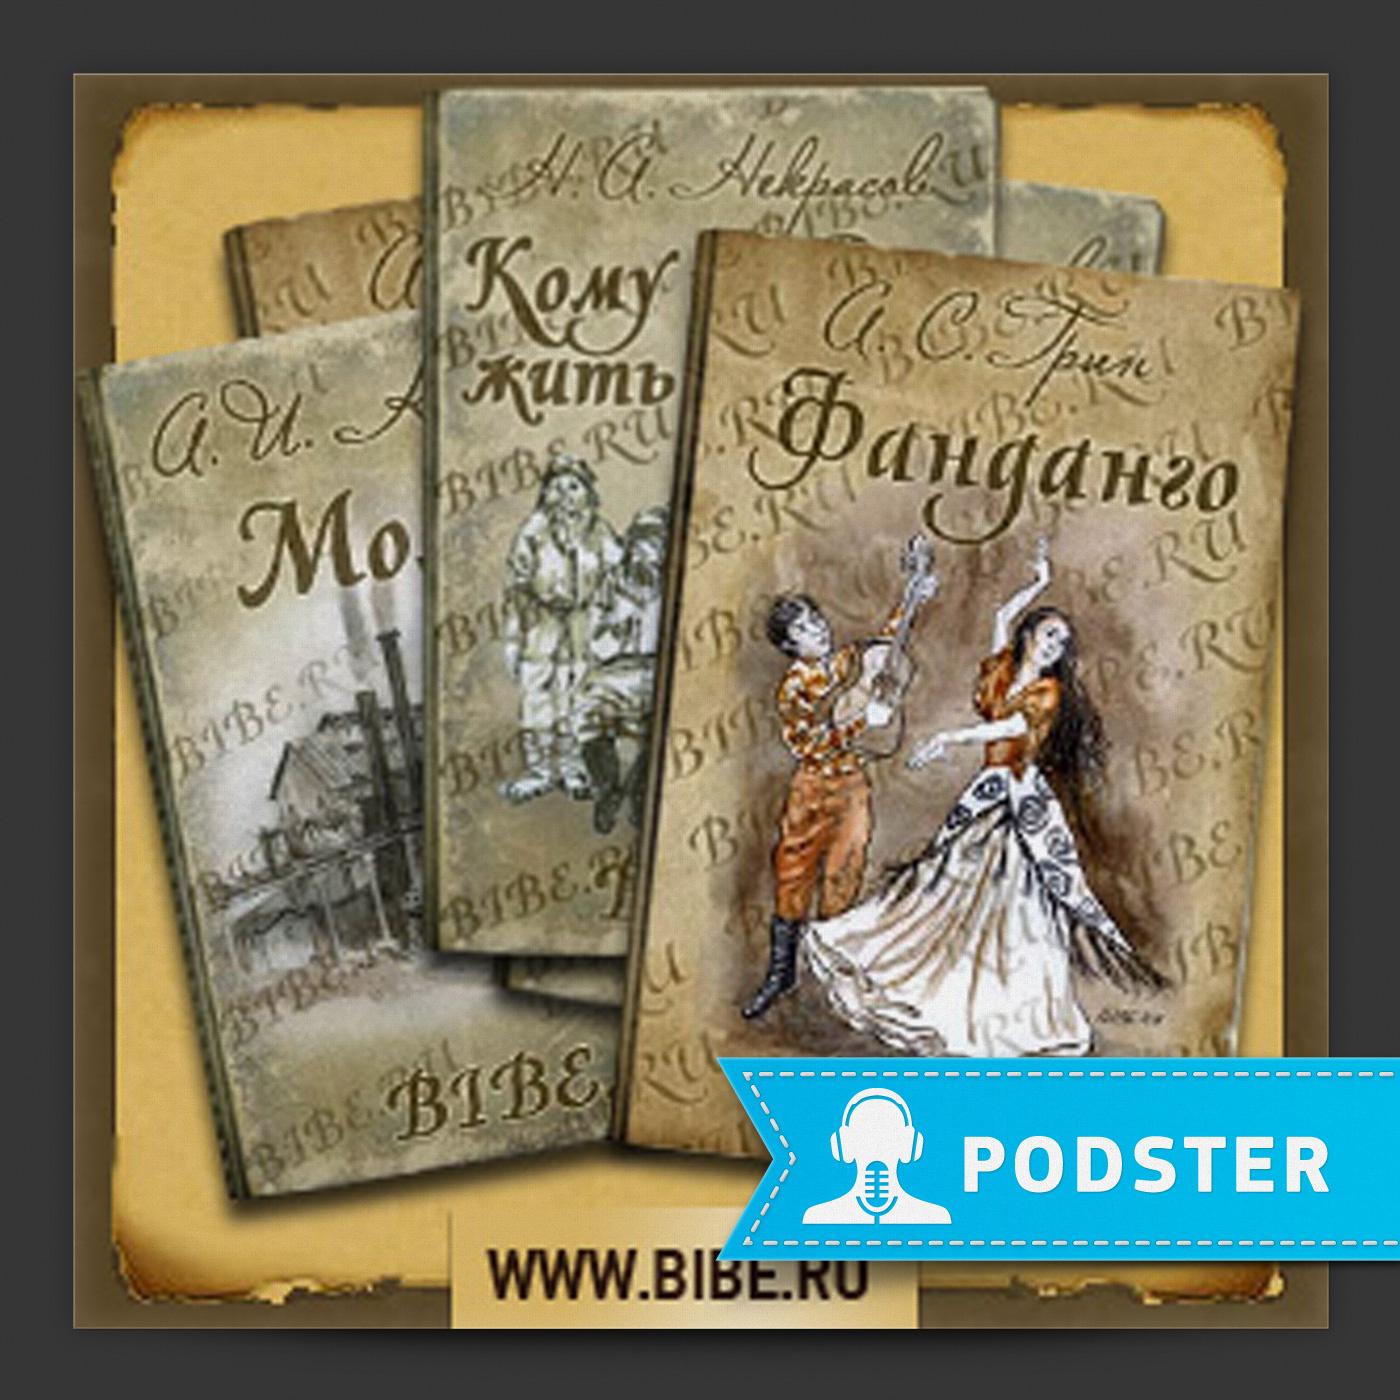 Аудиокниги от Bibe.ru